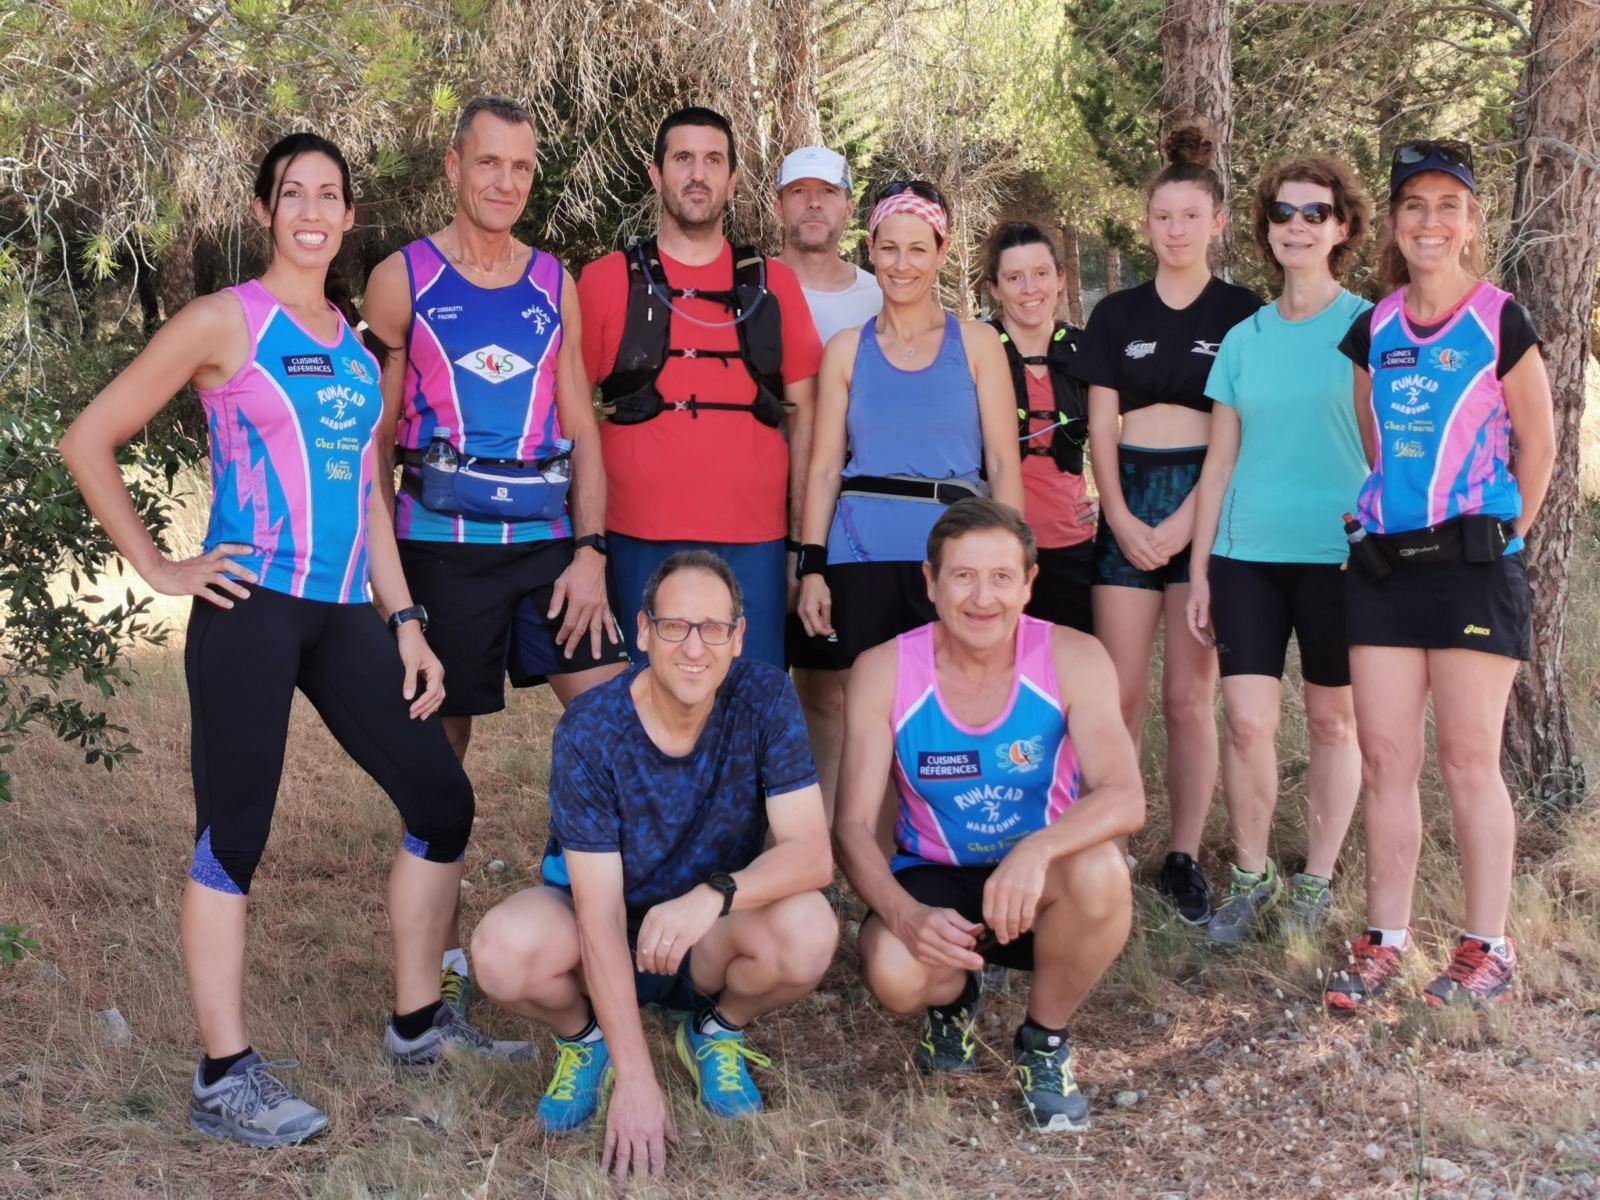 ACAD - Activités Sportives Run Acad'